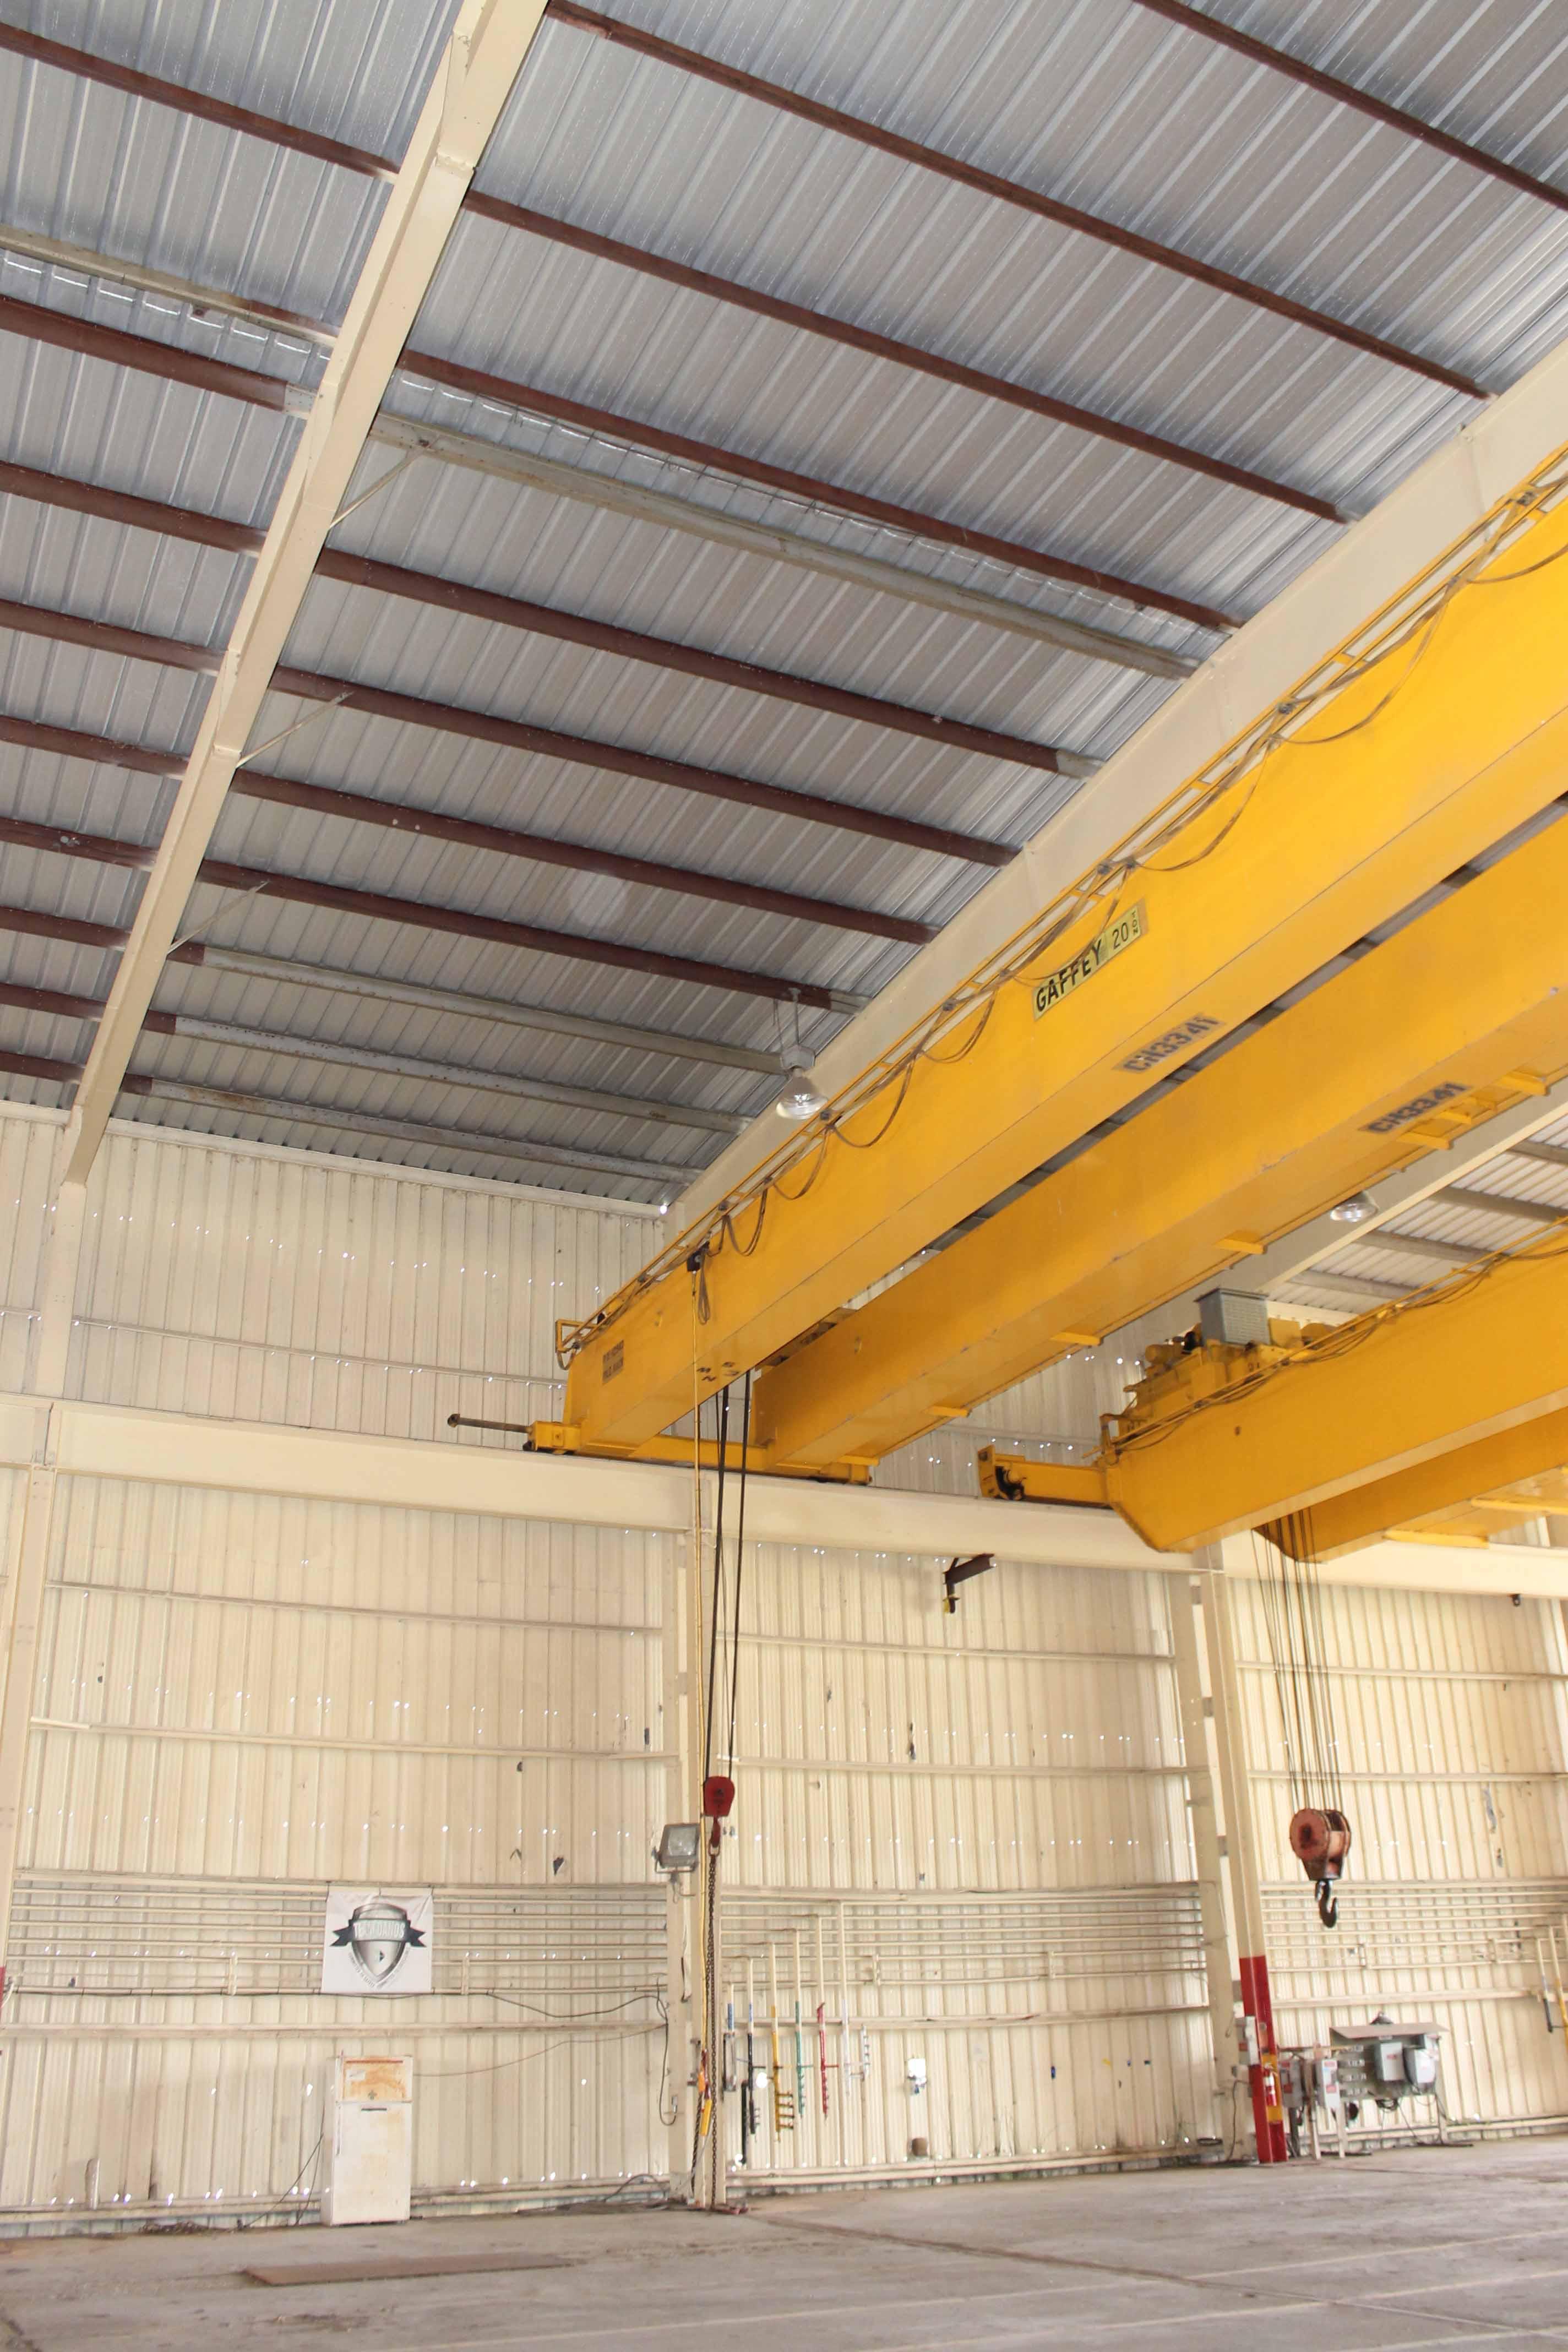 "Lot 10 - Overhead Bridge Crane, Gaffey 20 ton cap., x 73'-11-1/4"" span, dual box beam, top riding, pendant"